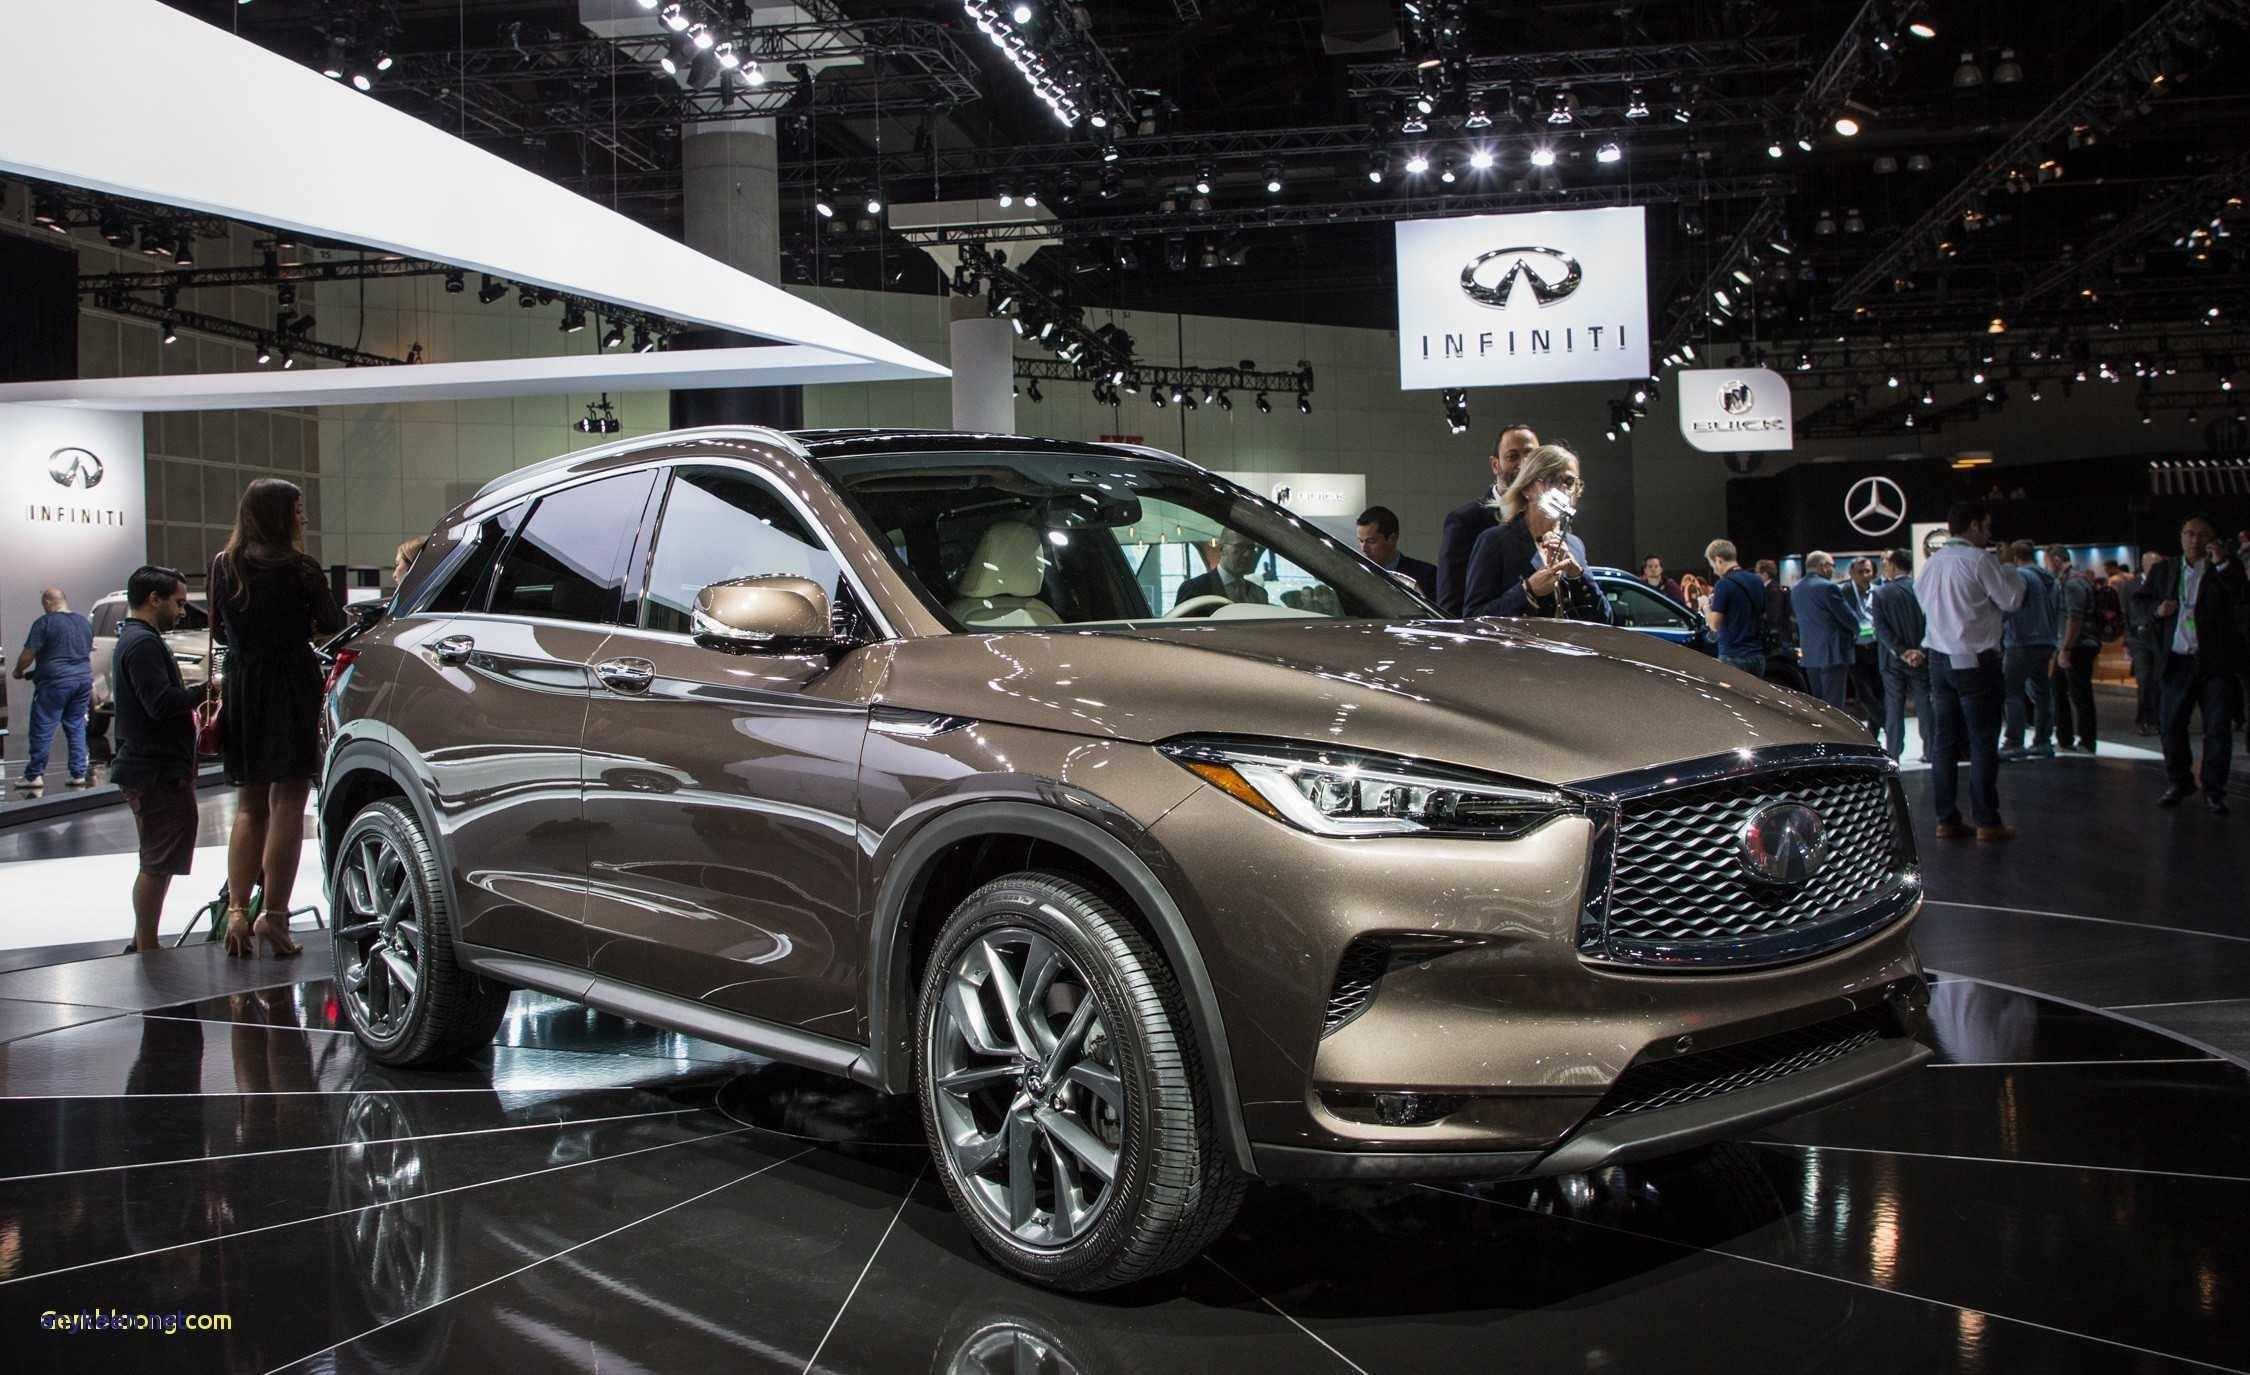 56 New New Volvo 2019 Elektrisch Release Date And Specs Exterior for New Volvo 2019 Elektrisch Release Date And Specs